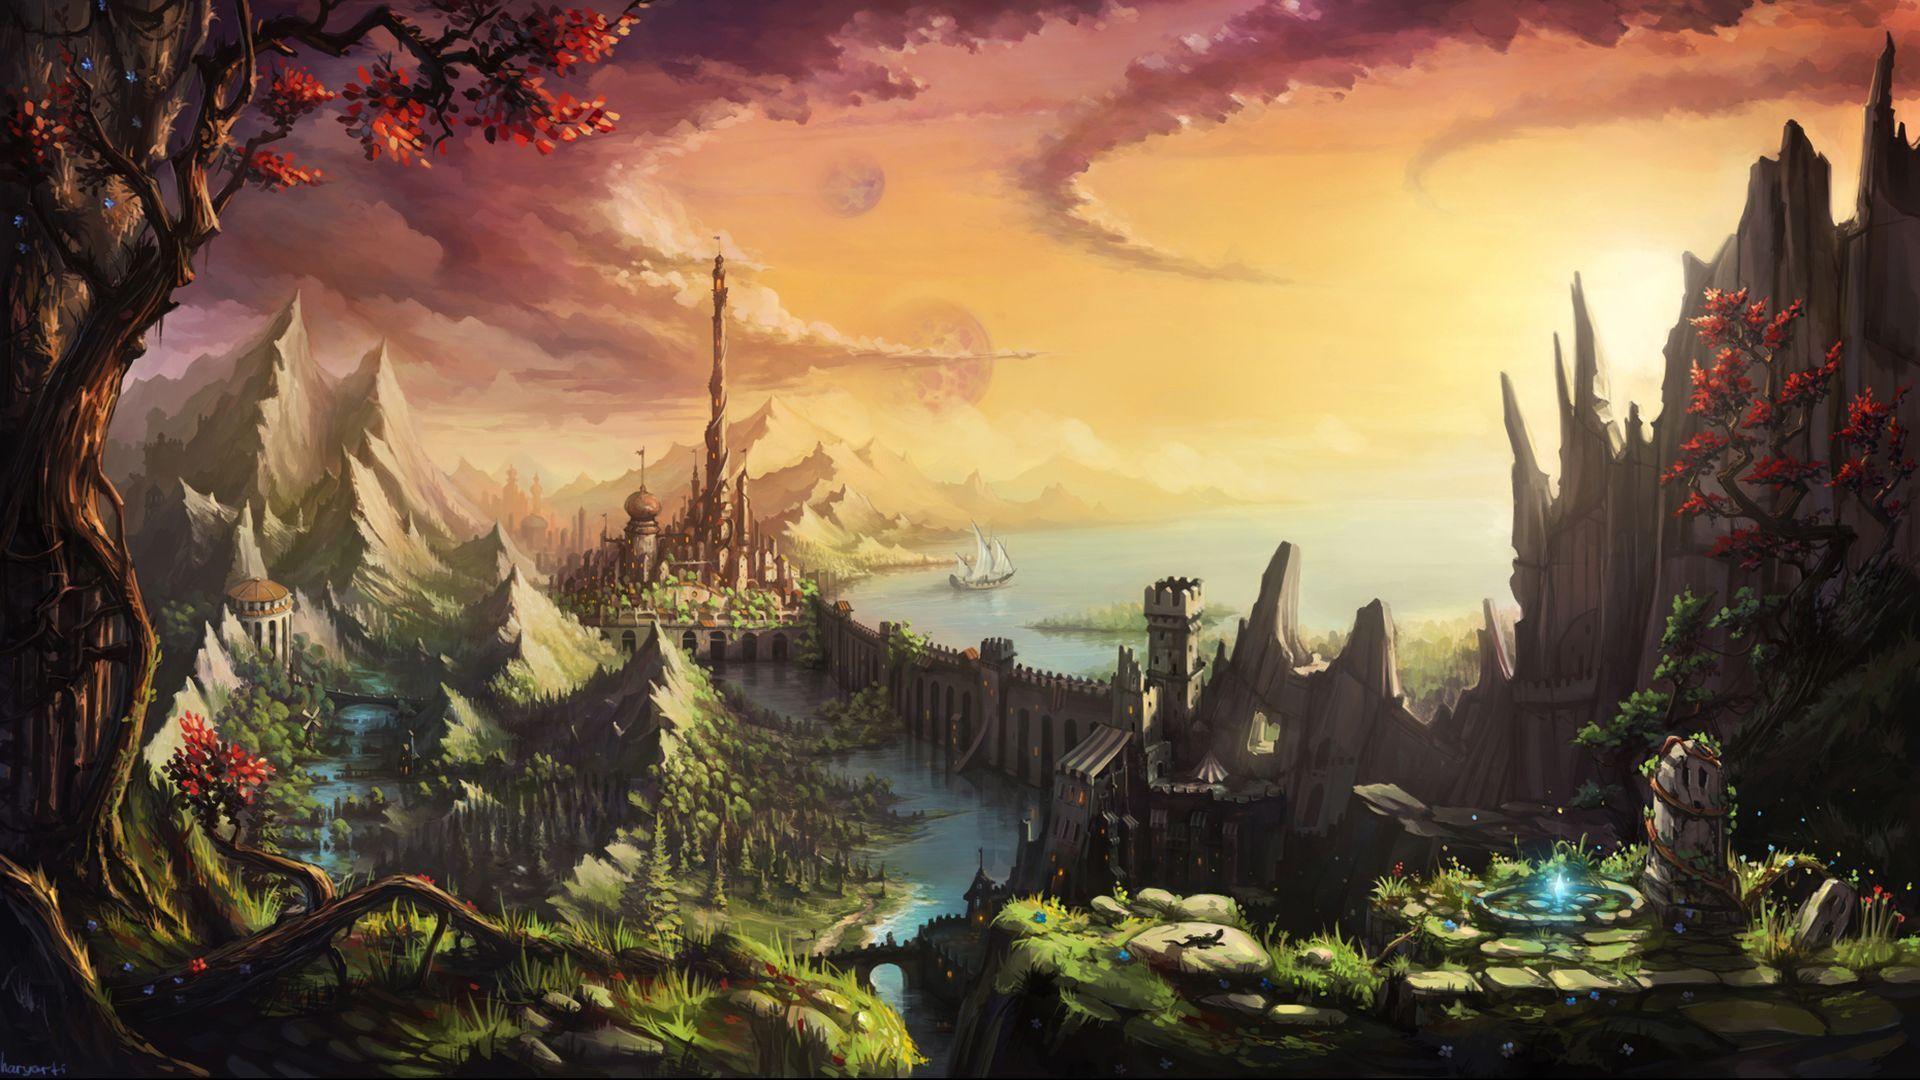 Fantasy Castle Wallpapers 1920x1080